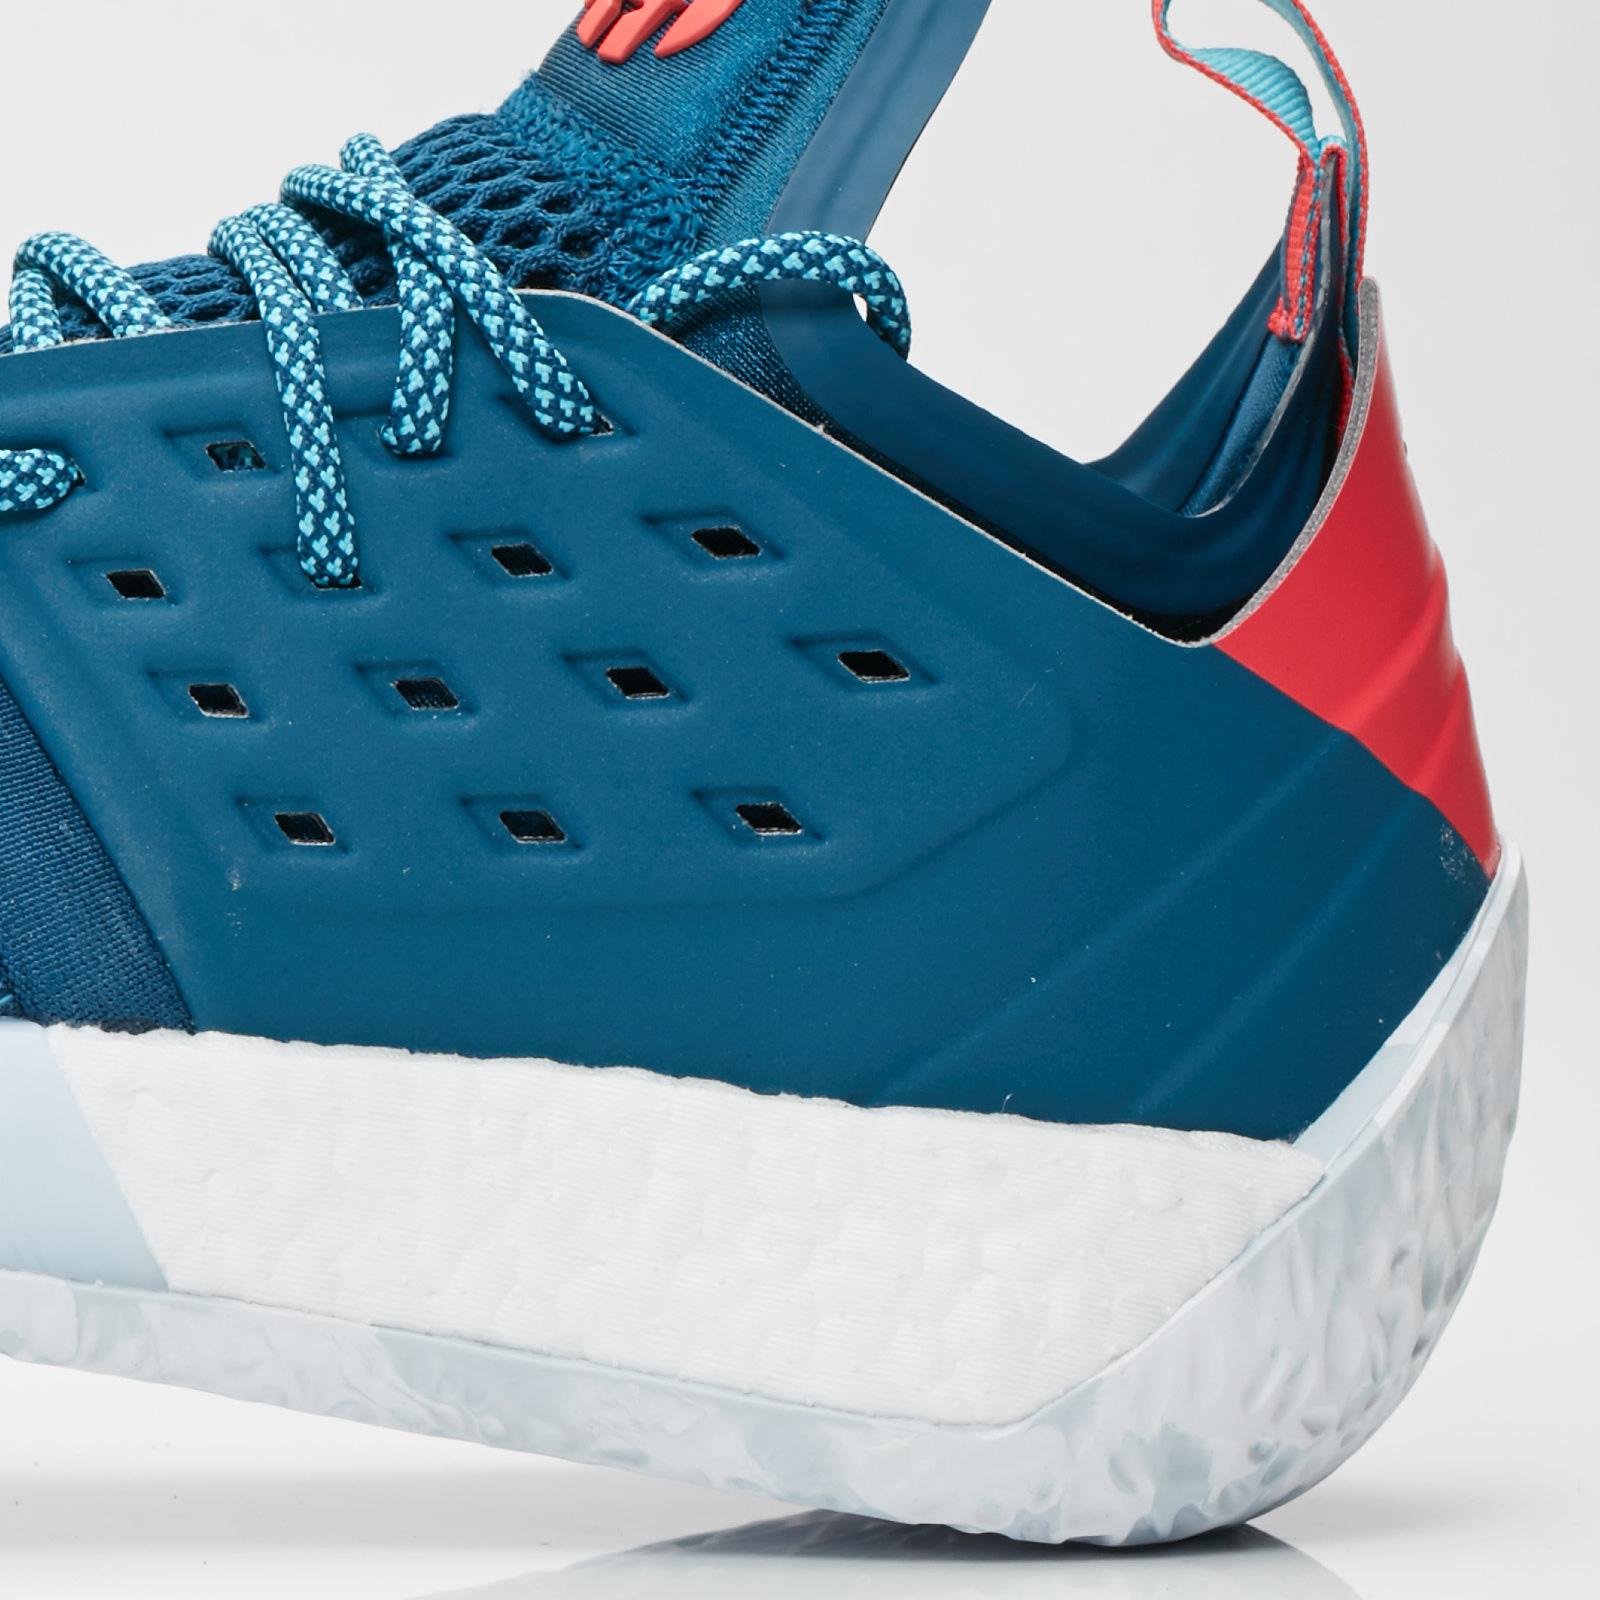 2 ah2216 scarpe da ginnasticanstuff scarpe adidas harden